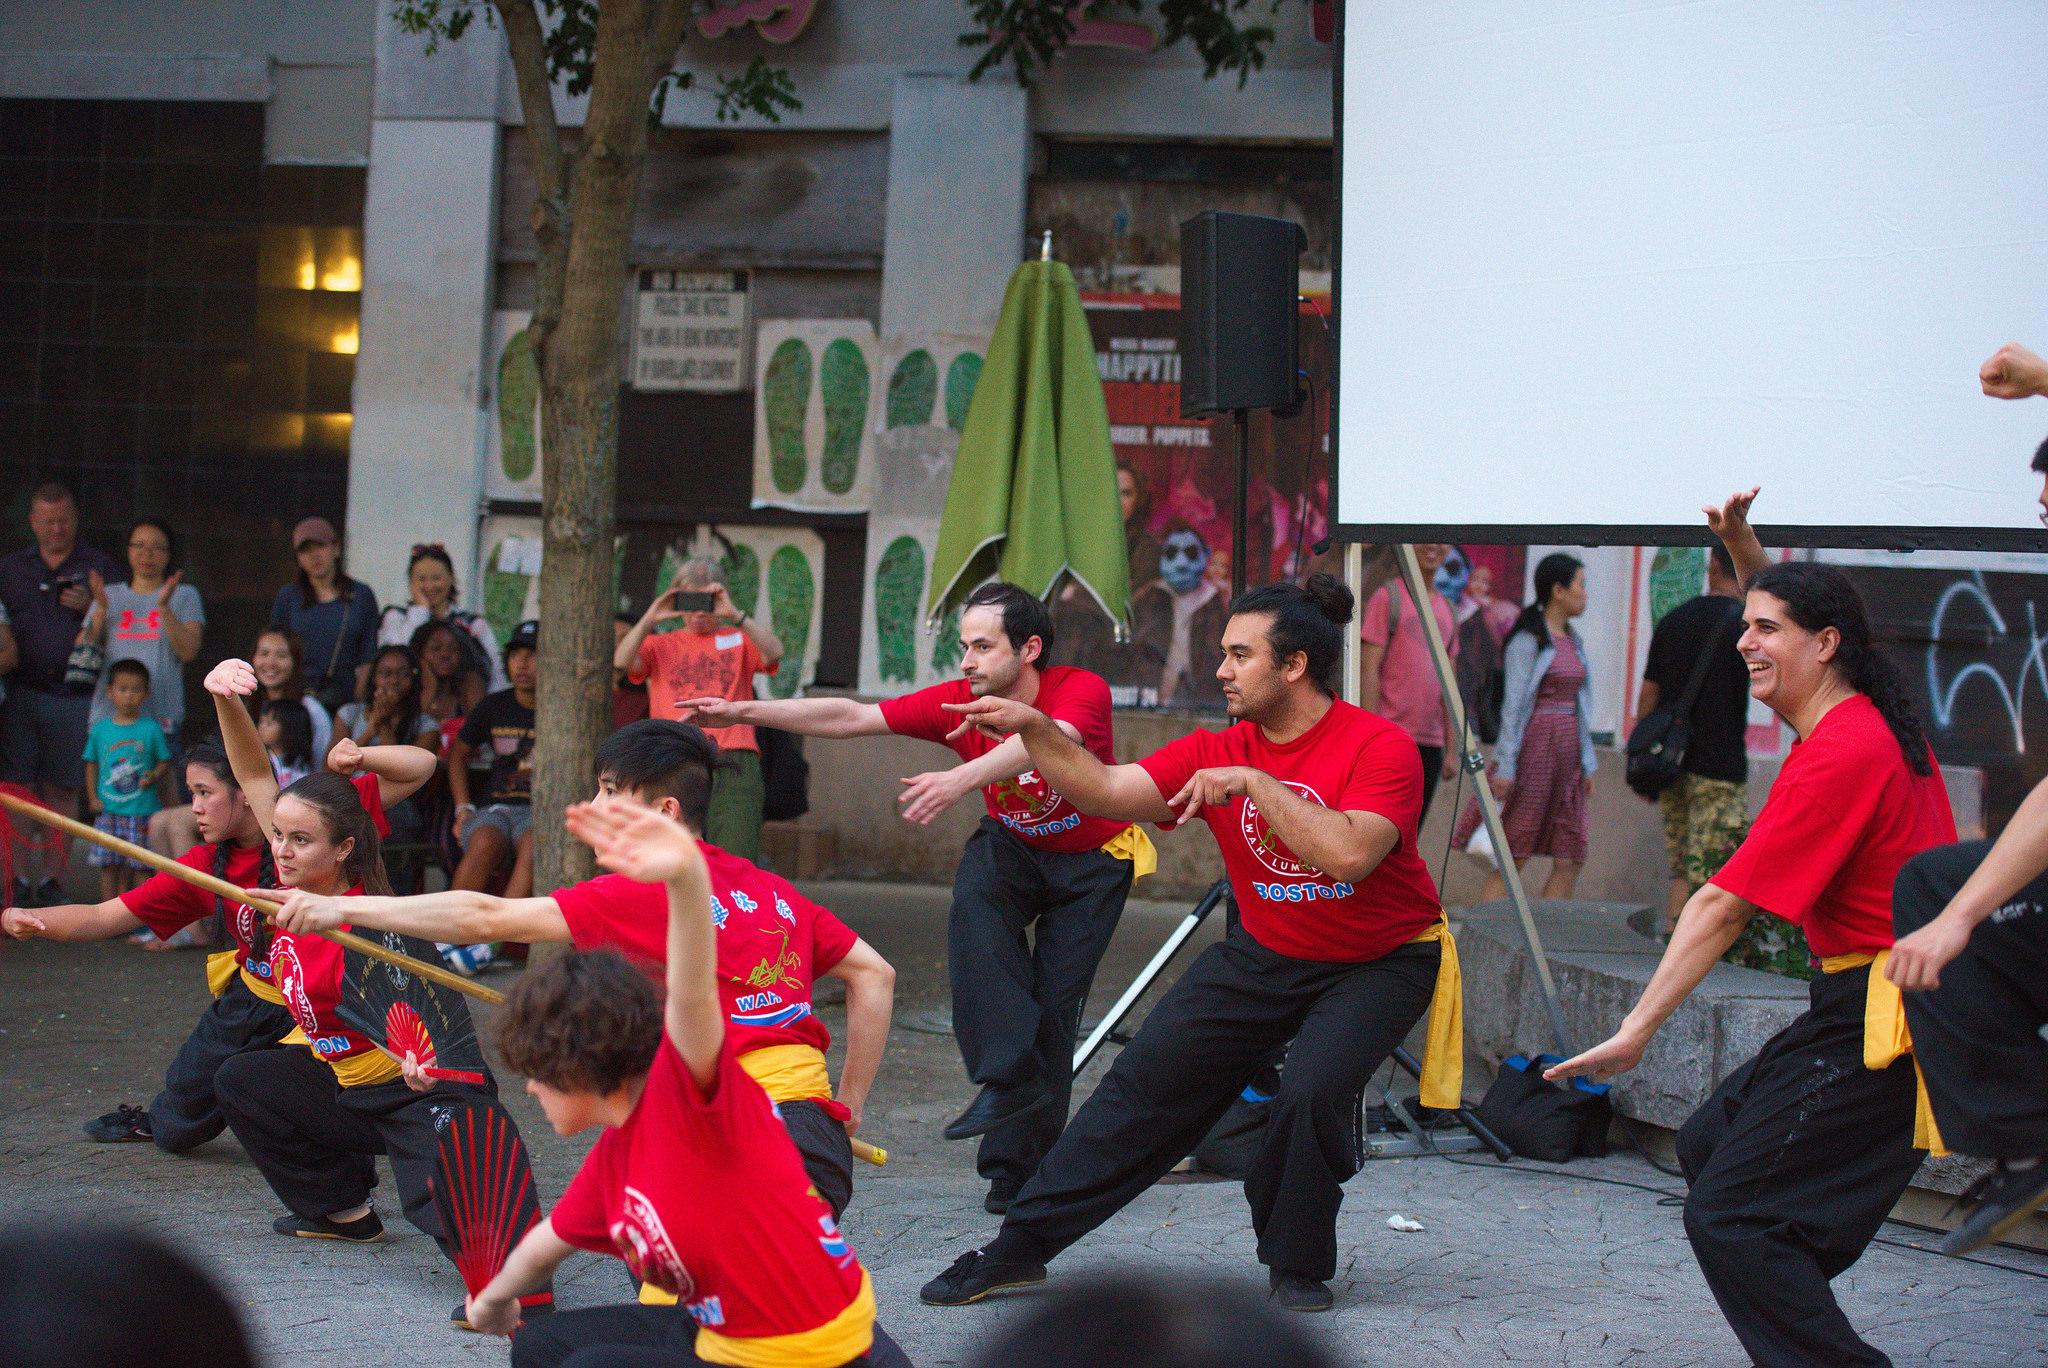 Martial Arts_Wah Lum Demonstration.jpg